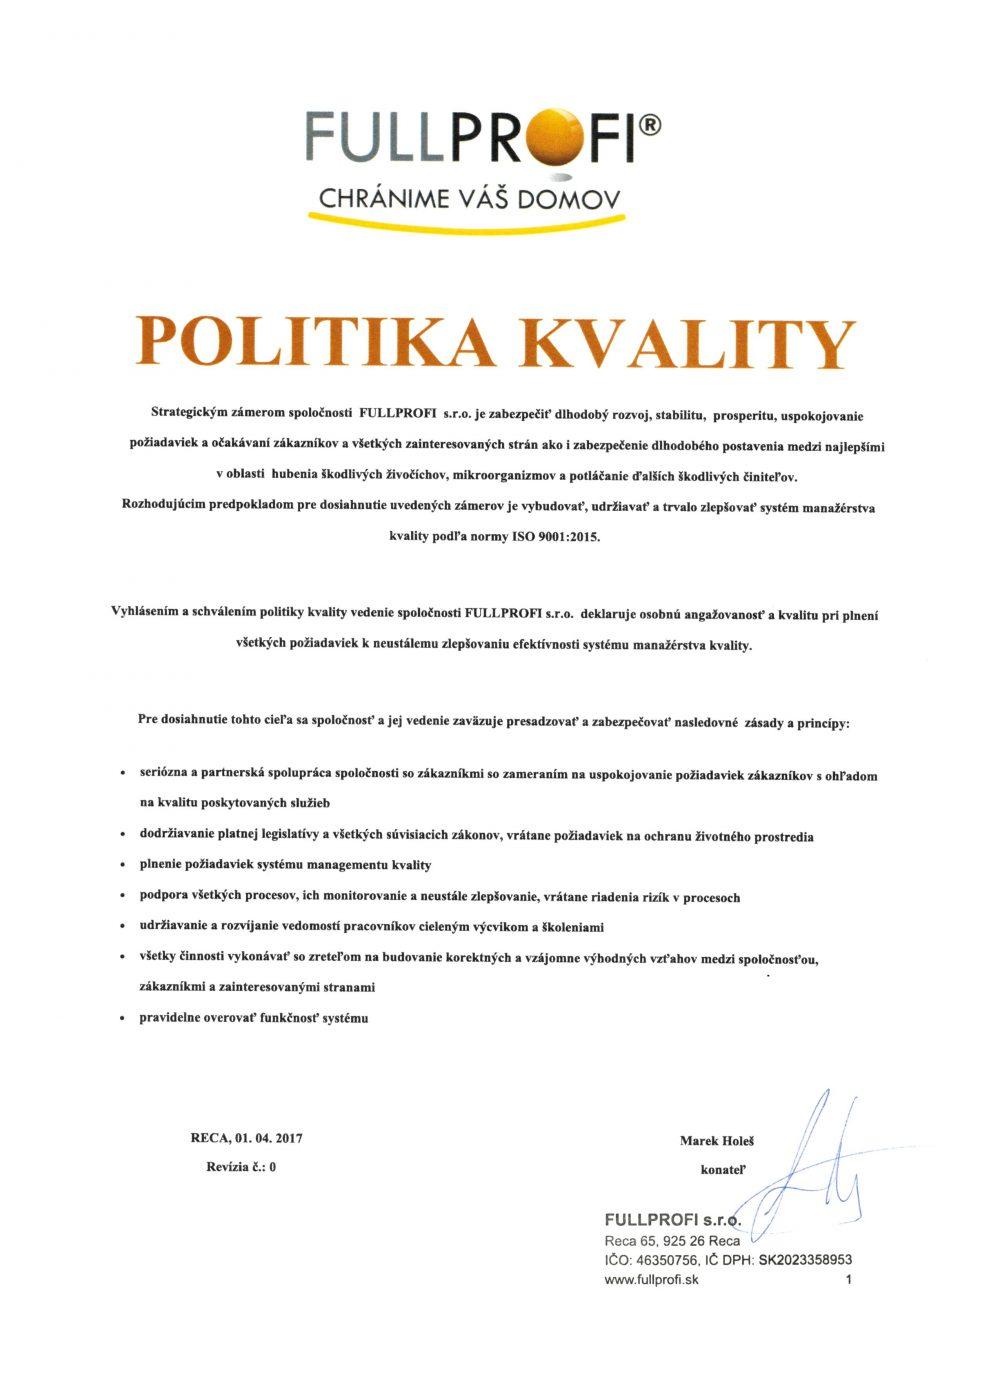 Politika kvality scan